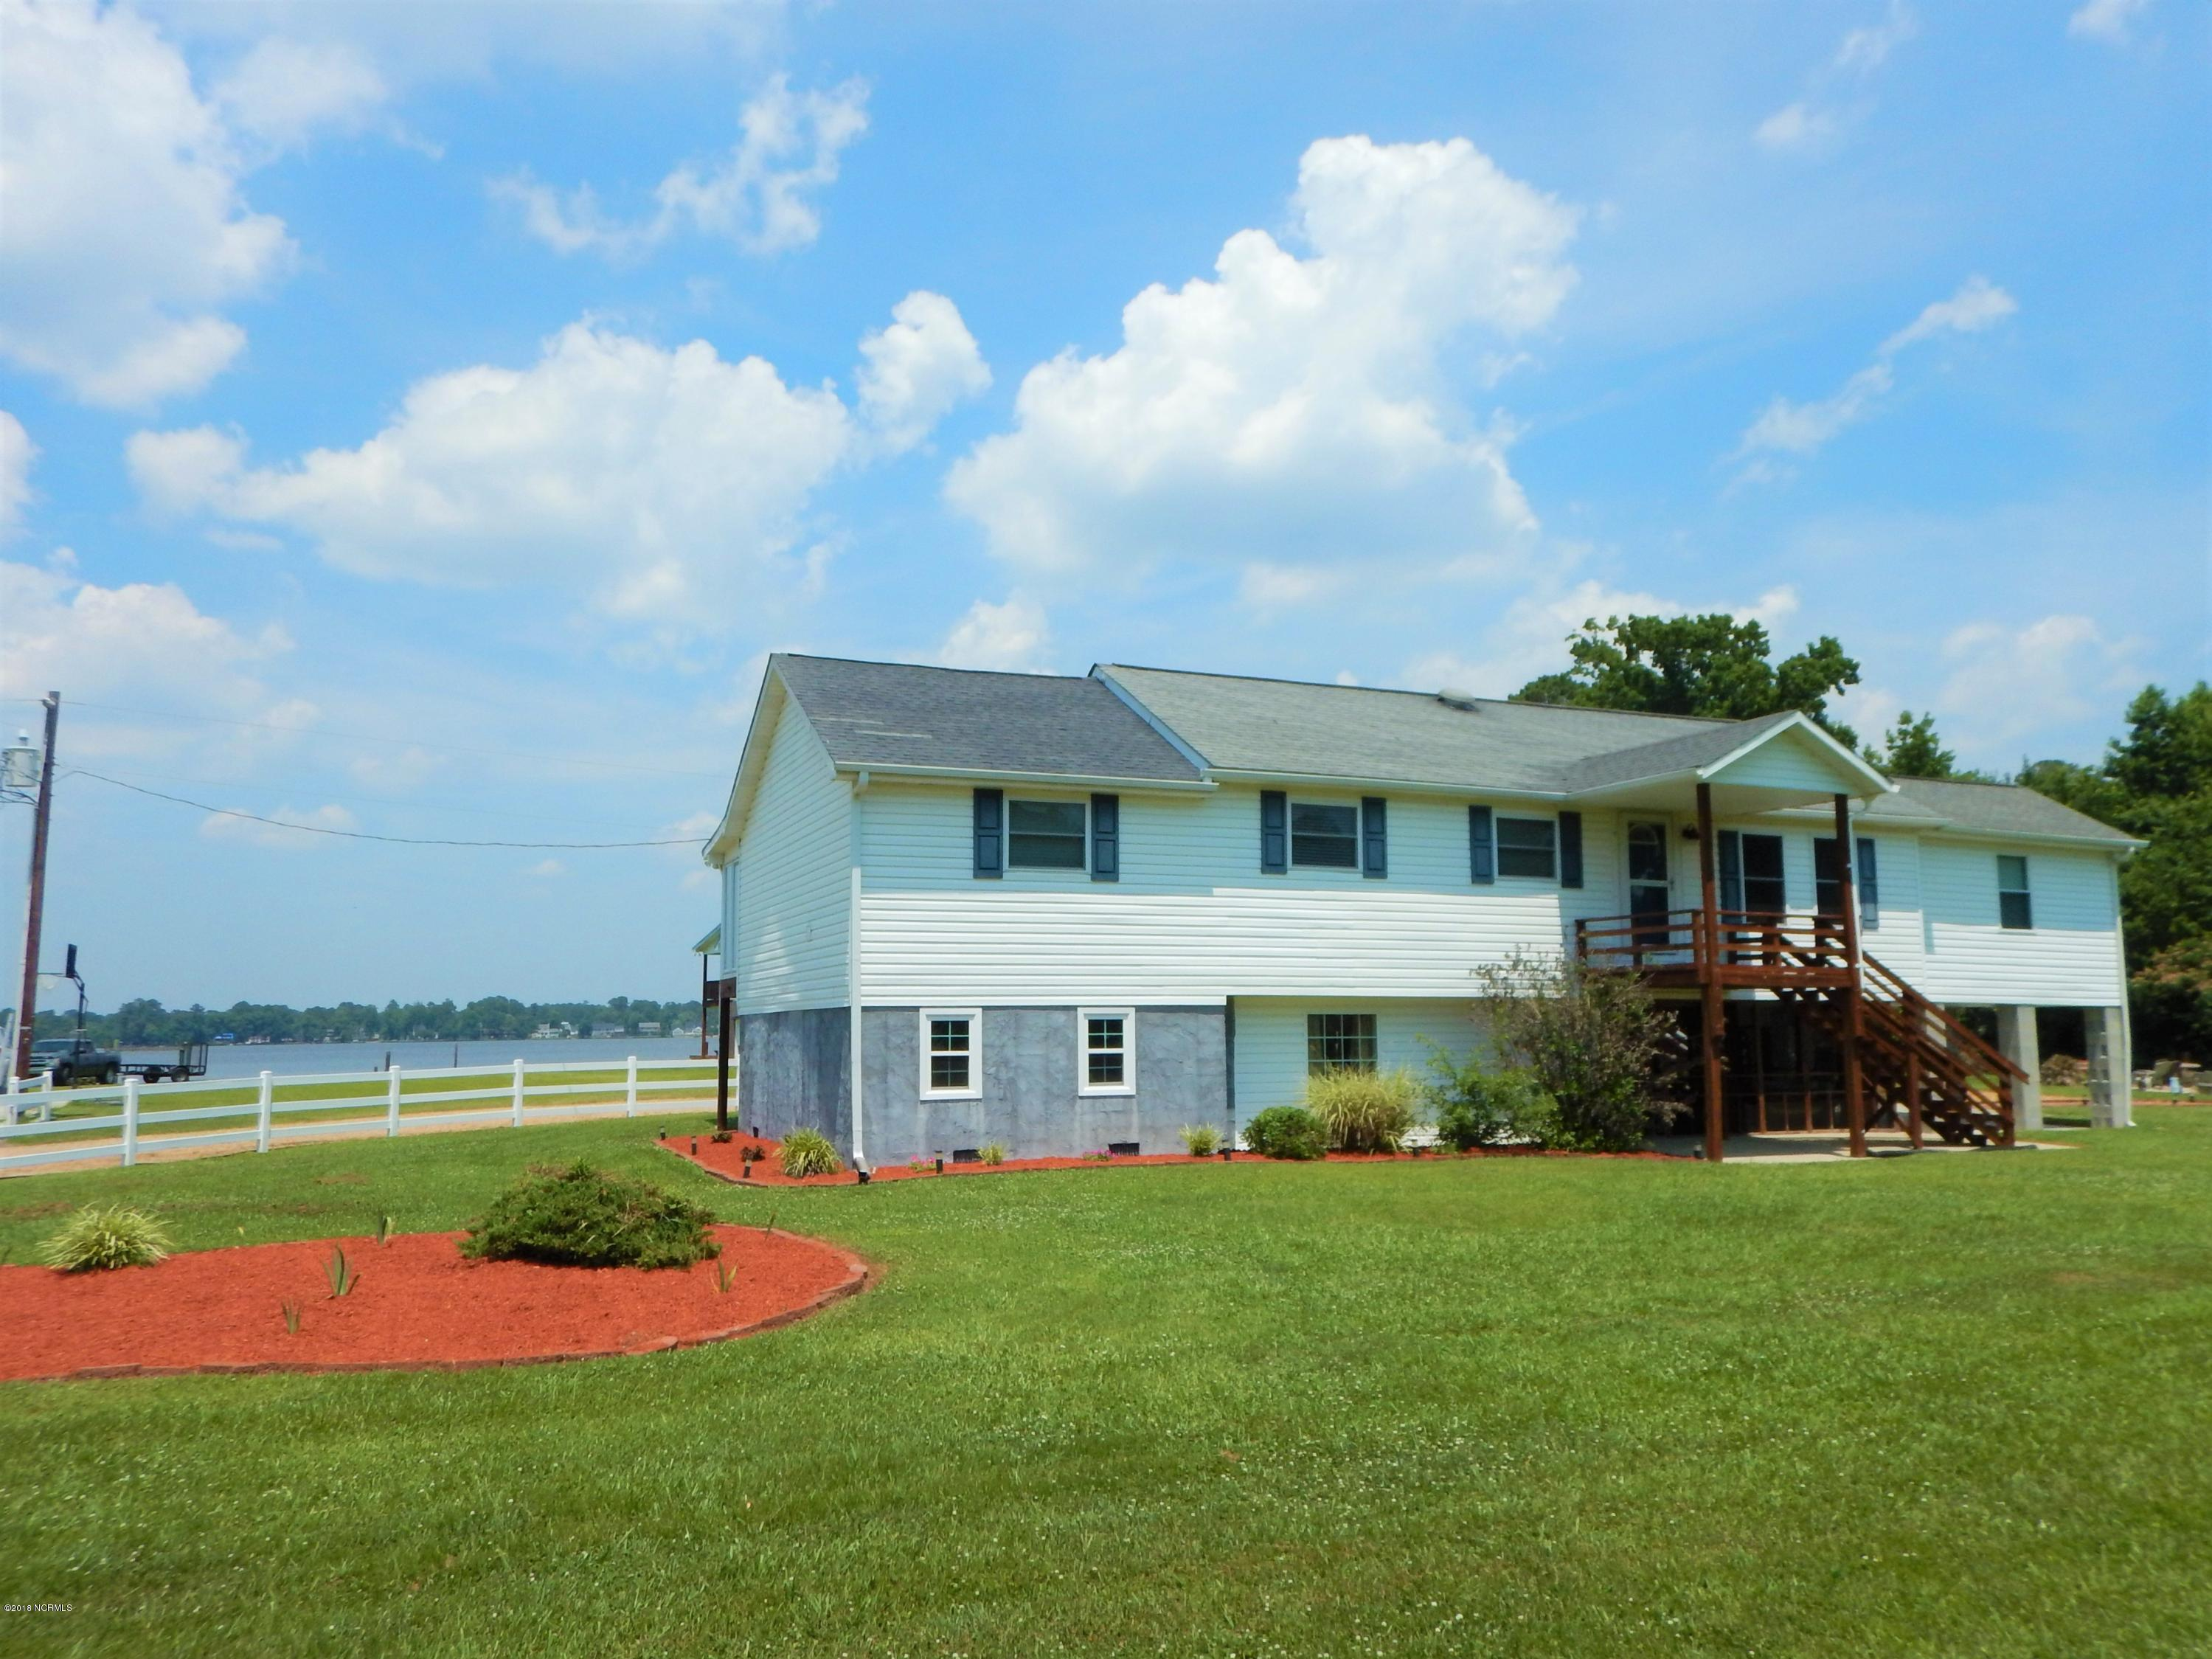 200 Fairwind Drive, Chocowinity, North Carolina, 3 Bedrooms Bedrooms, 7 Rooms Rooms,3 BathroomsBathrooms,Manufactured home,For sale,Fairwind,100122883